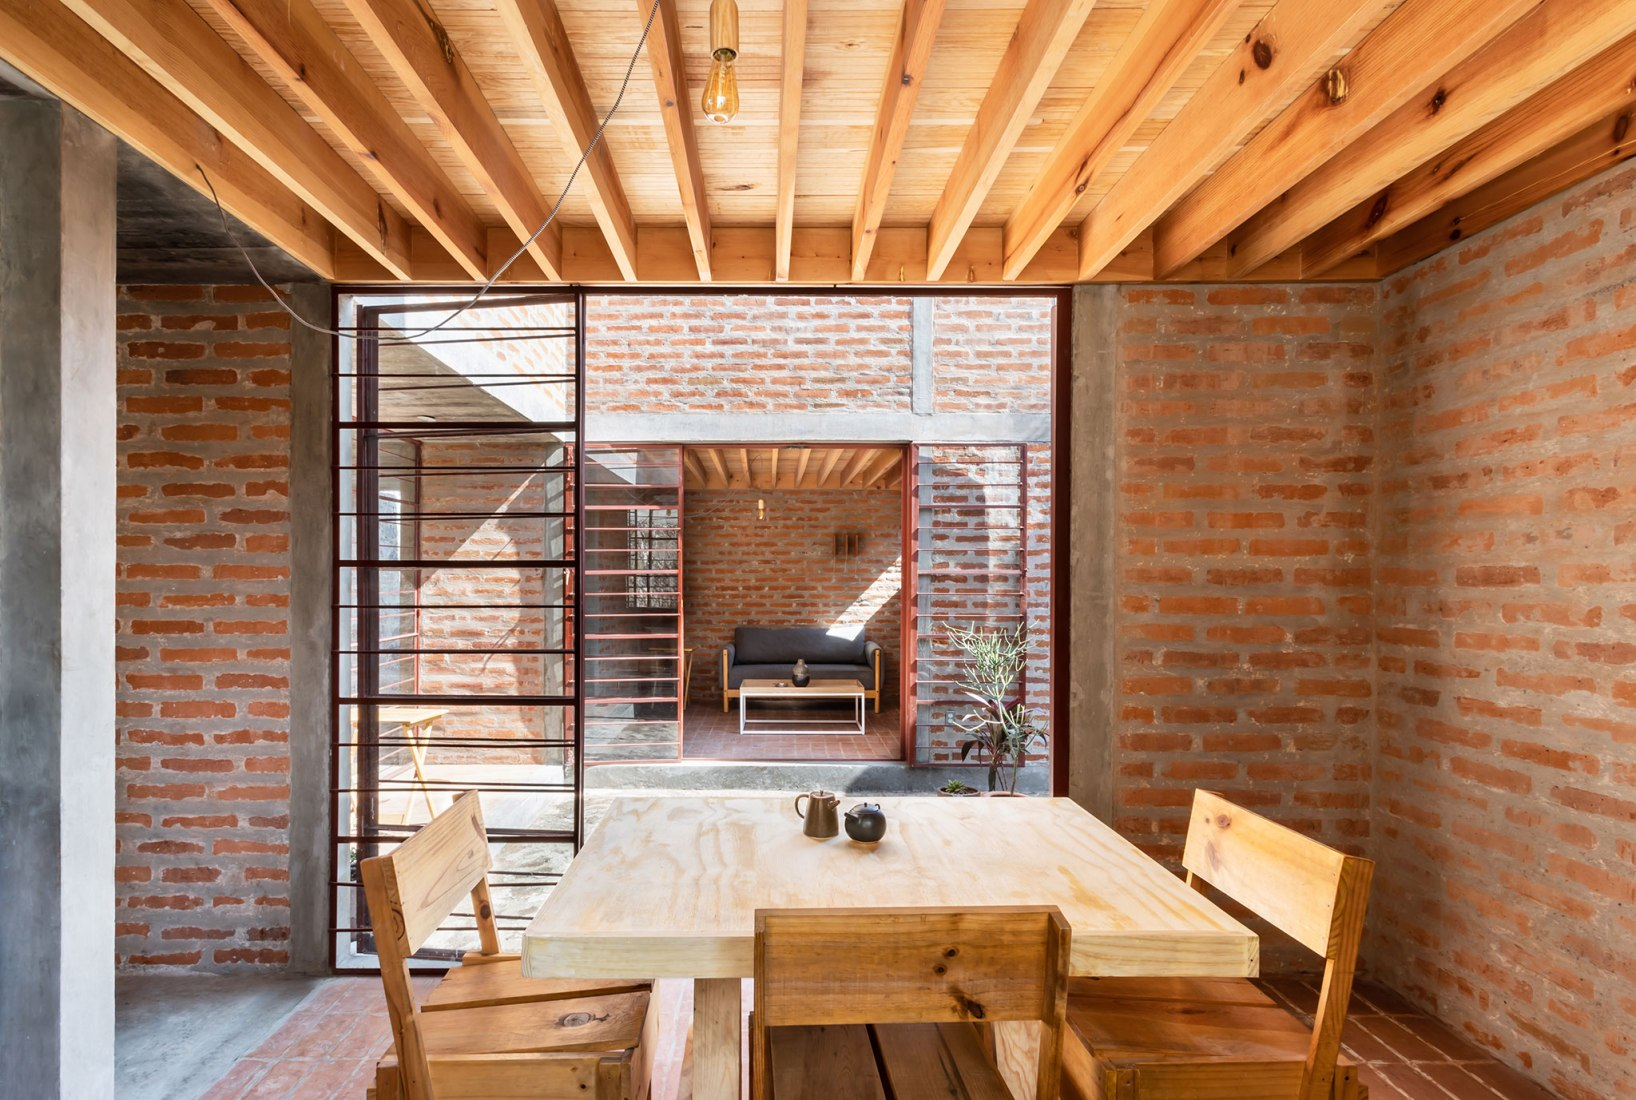 Casa Nakasone por Pavel Escobedo y Andrés Soliz. Fotografía por Ariadna Polo